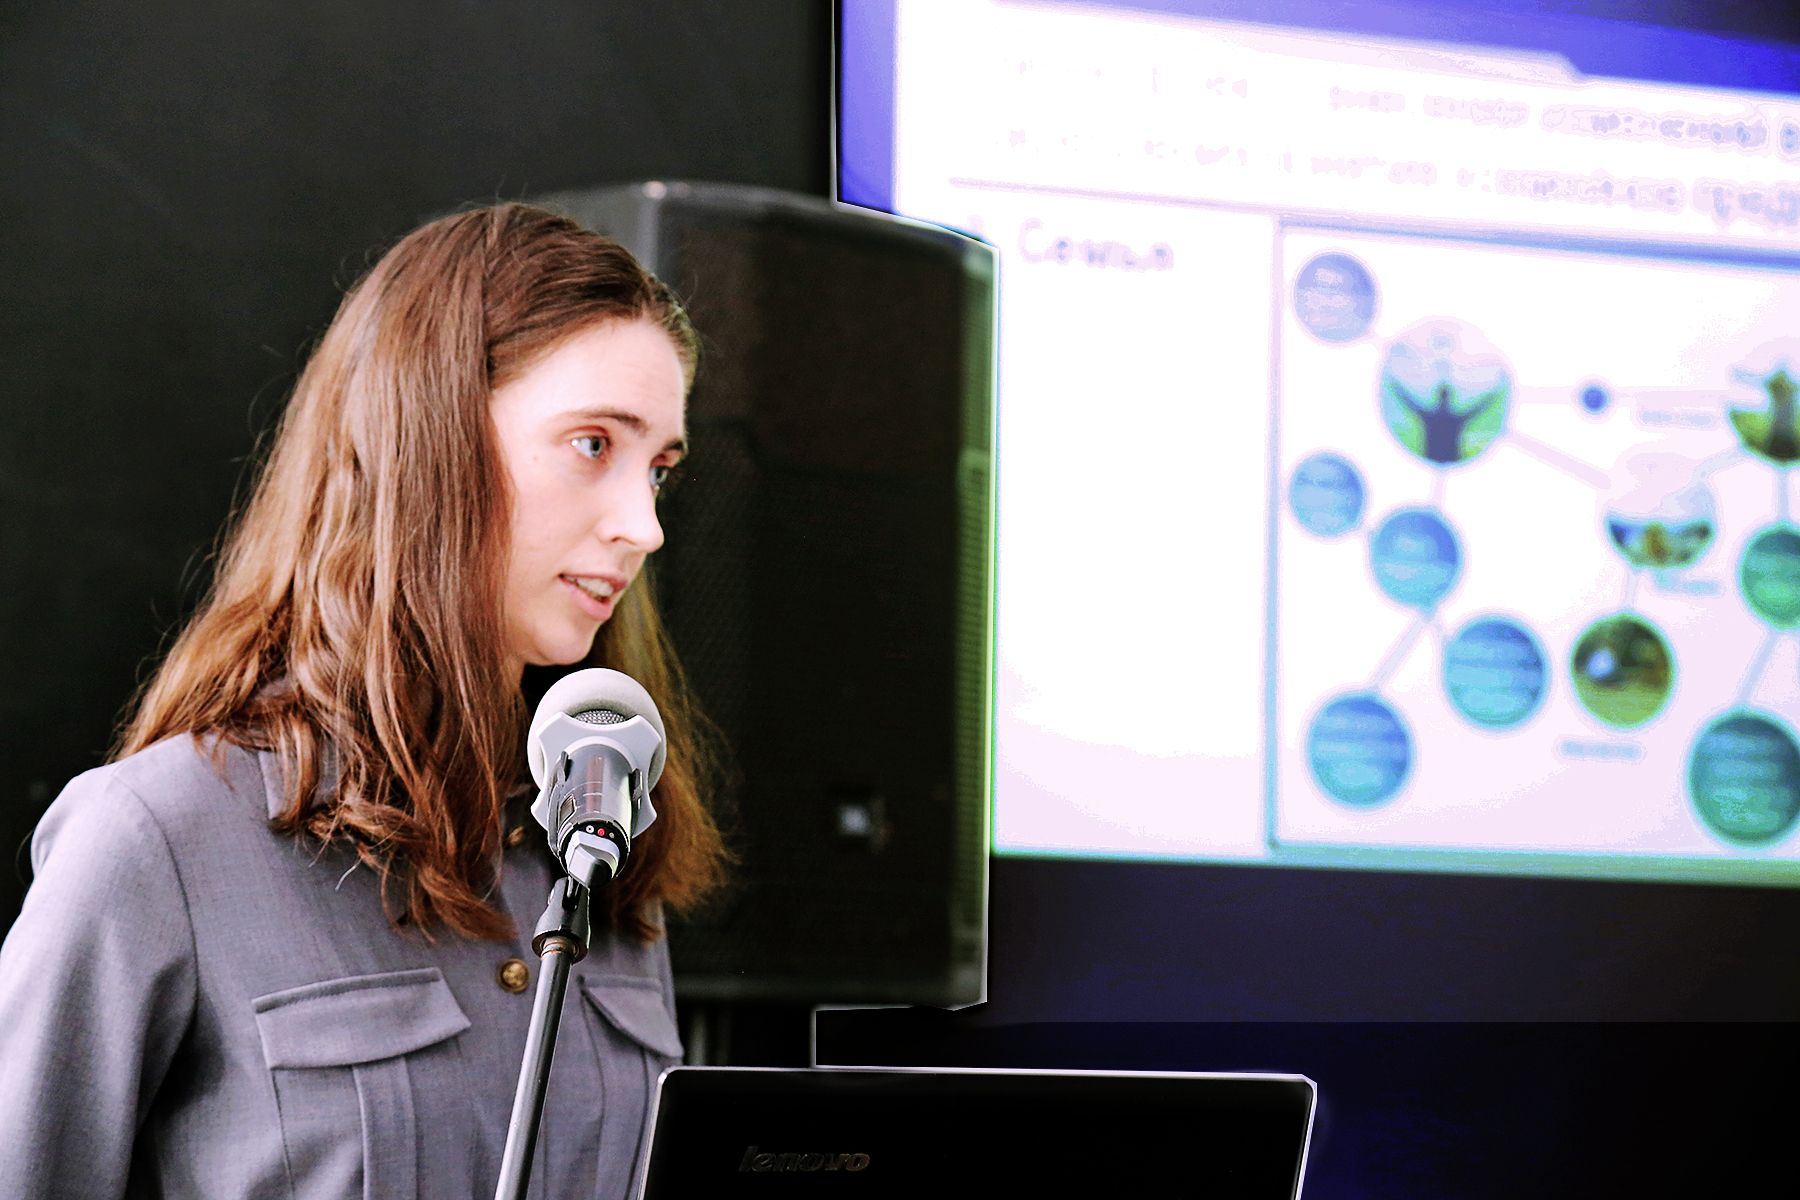 Аспирантка ВГУЭС представила университет на международной конференции 6th International Research Forum on Mittelstand